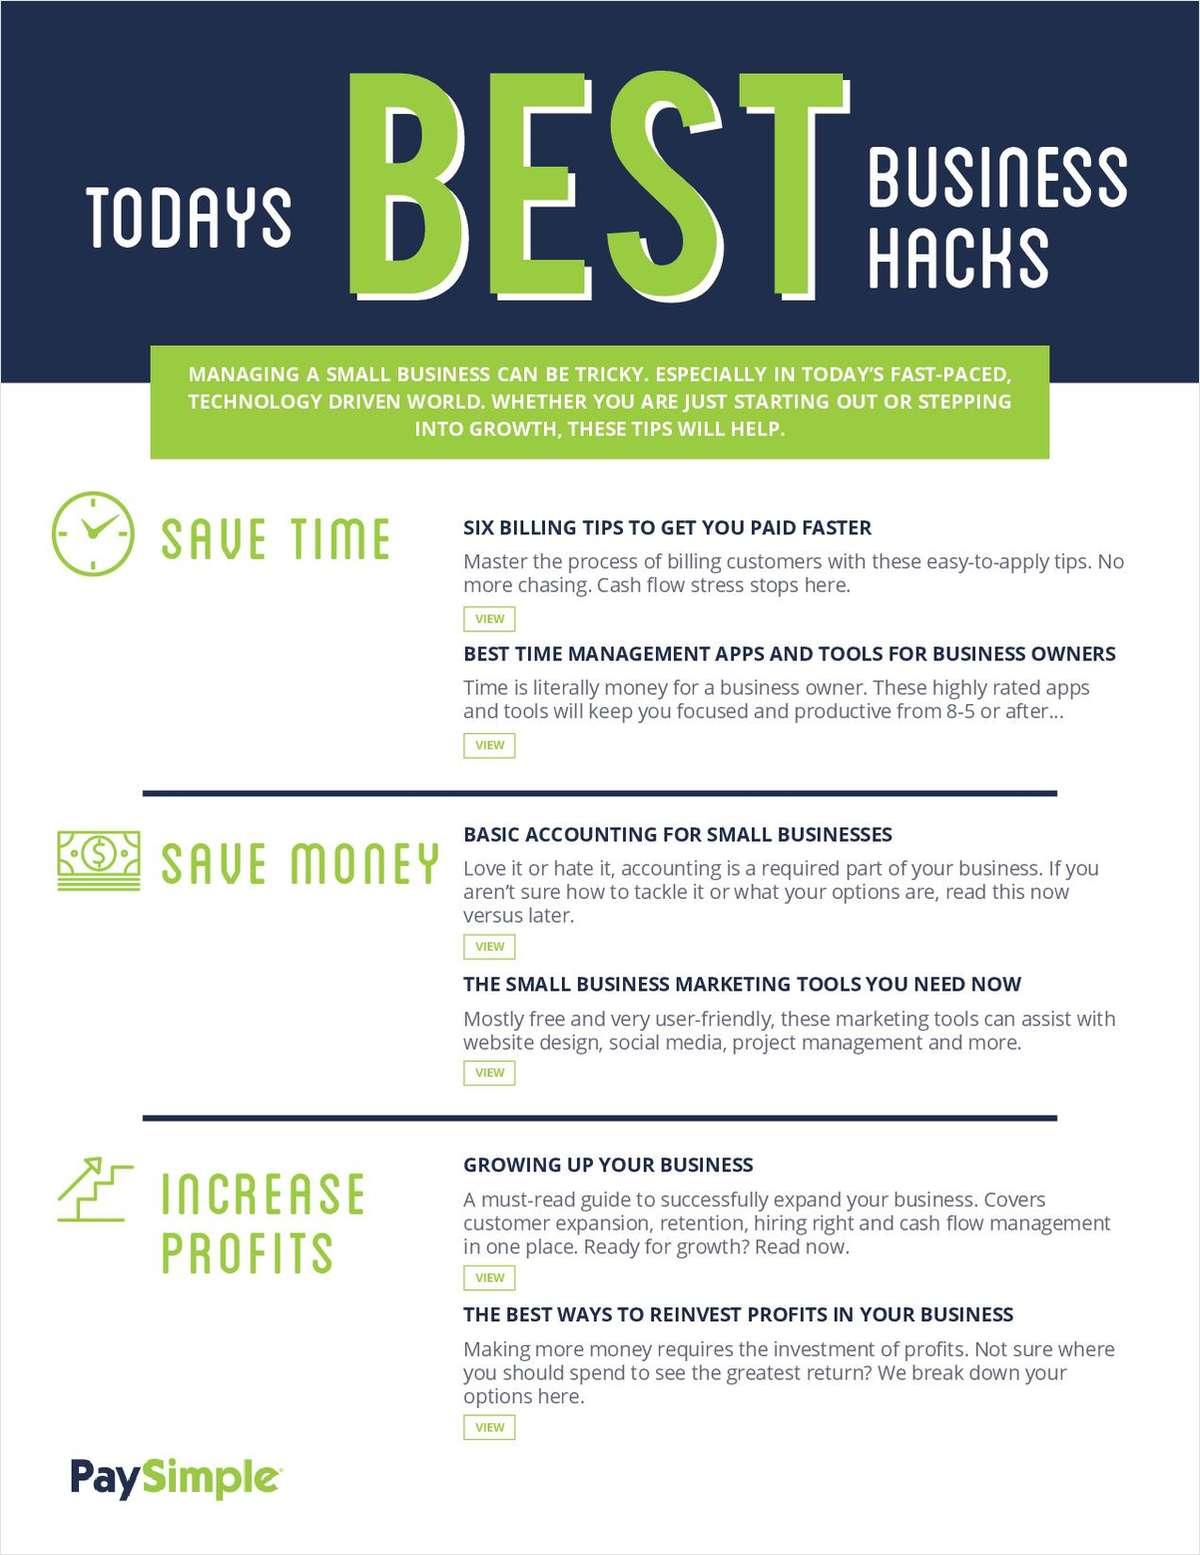 Best Business Hacks Today